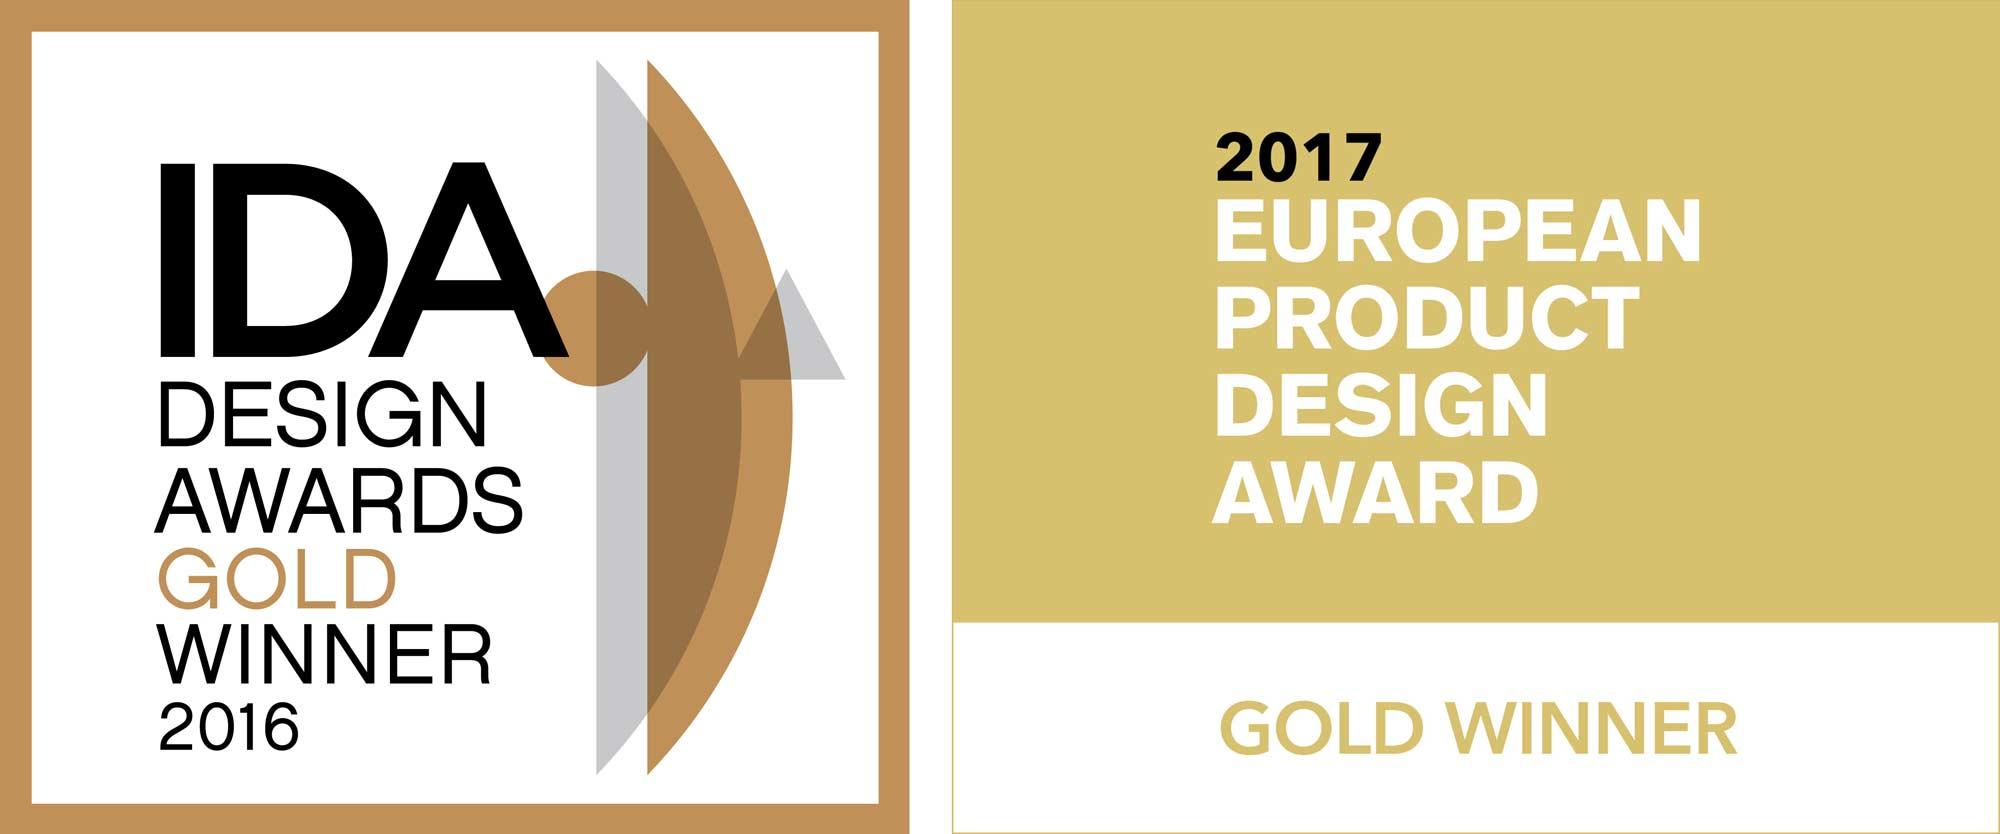 Awards - •2016, International Design Award,Gold Winner •2016, International Design Award,Product Design of Year•2017, European Product Design Award, Gold Winner